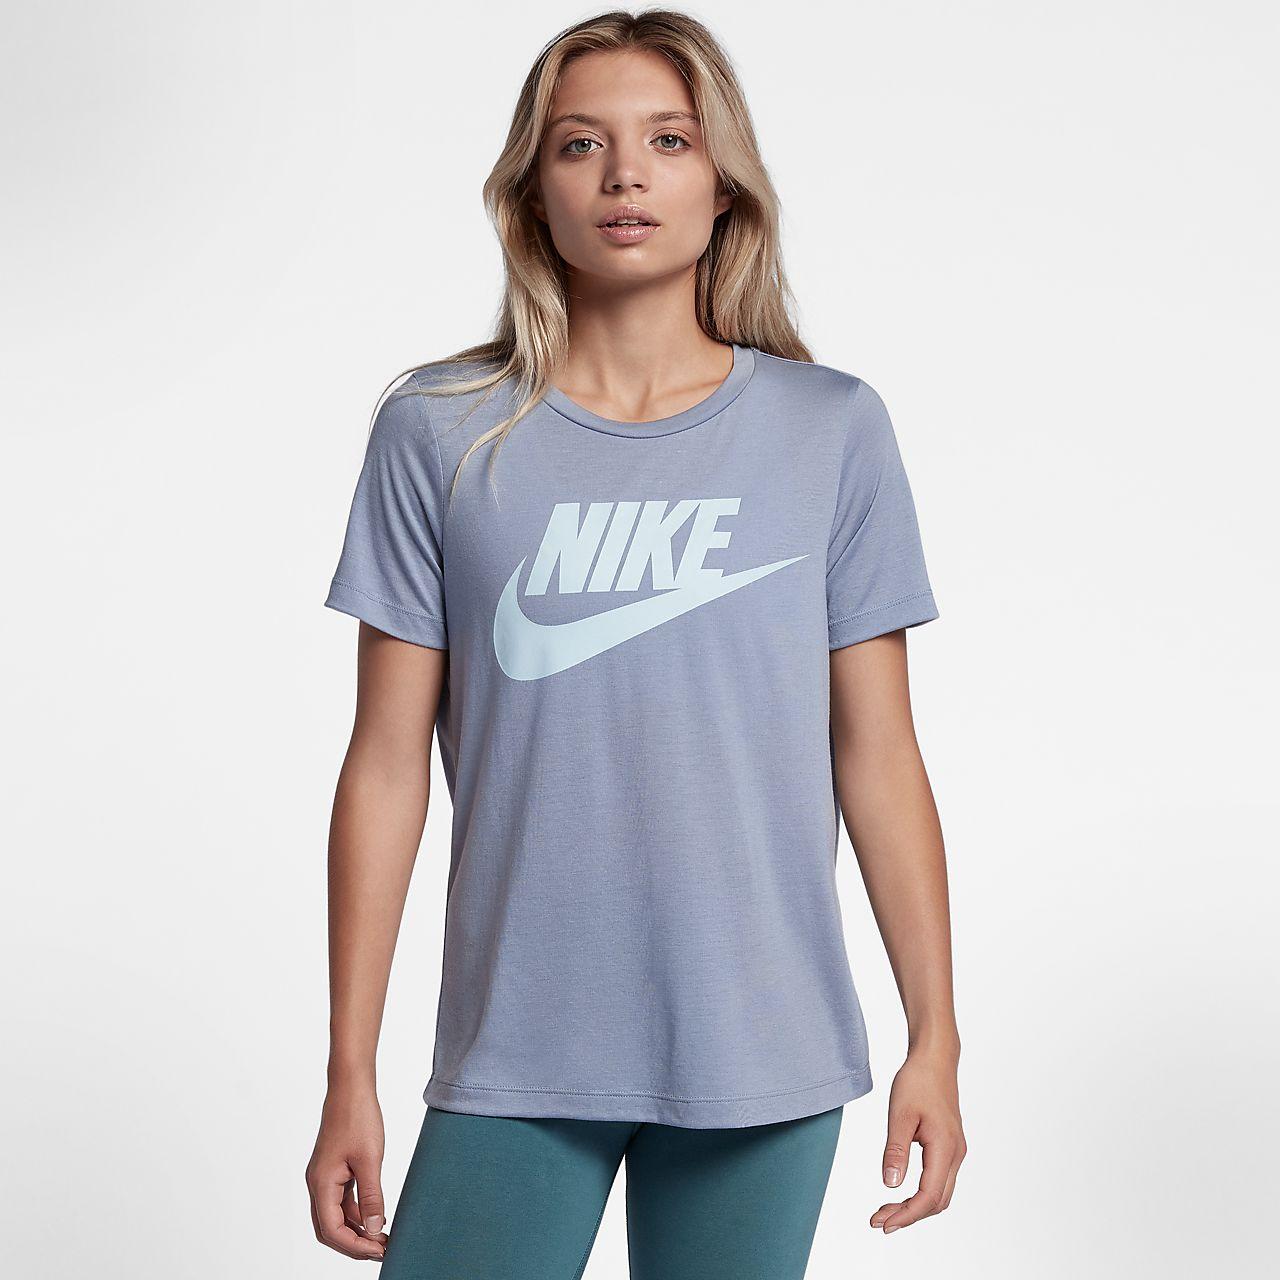 Nike Camouflage Damen